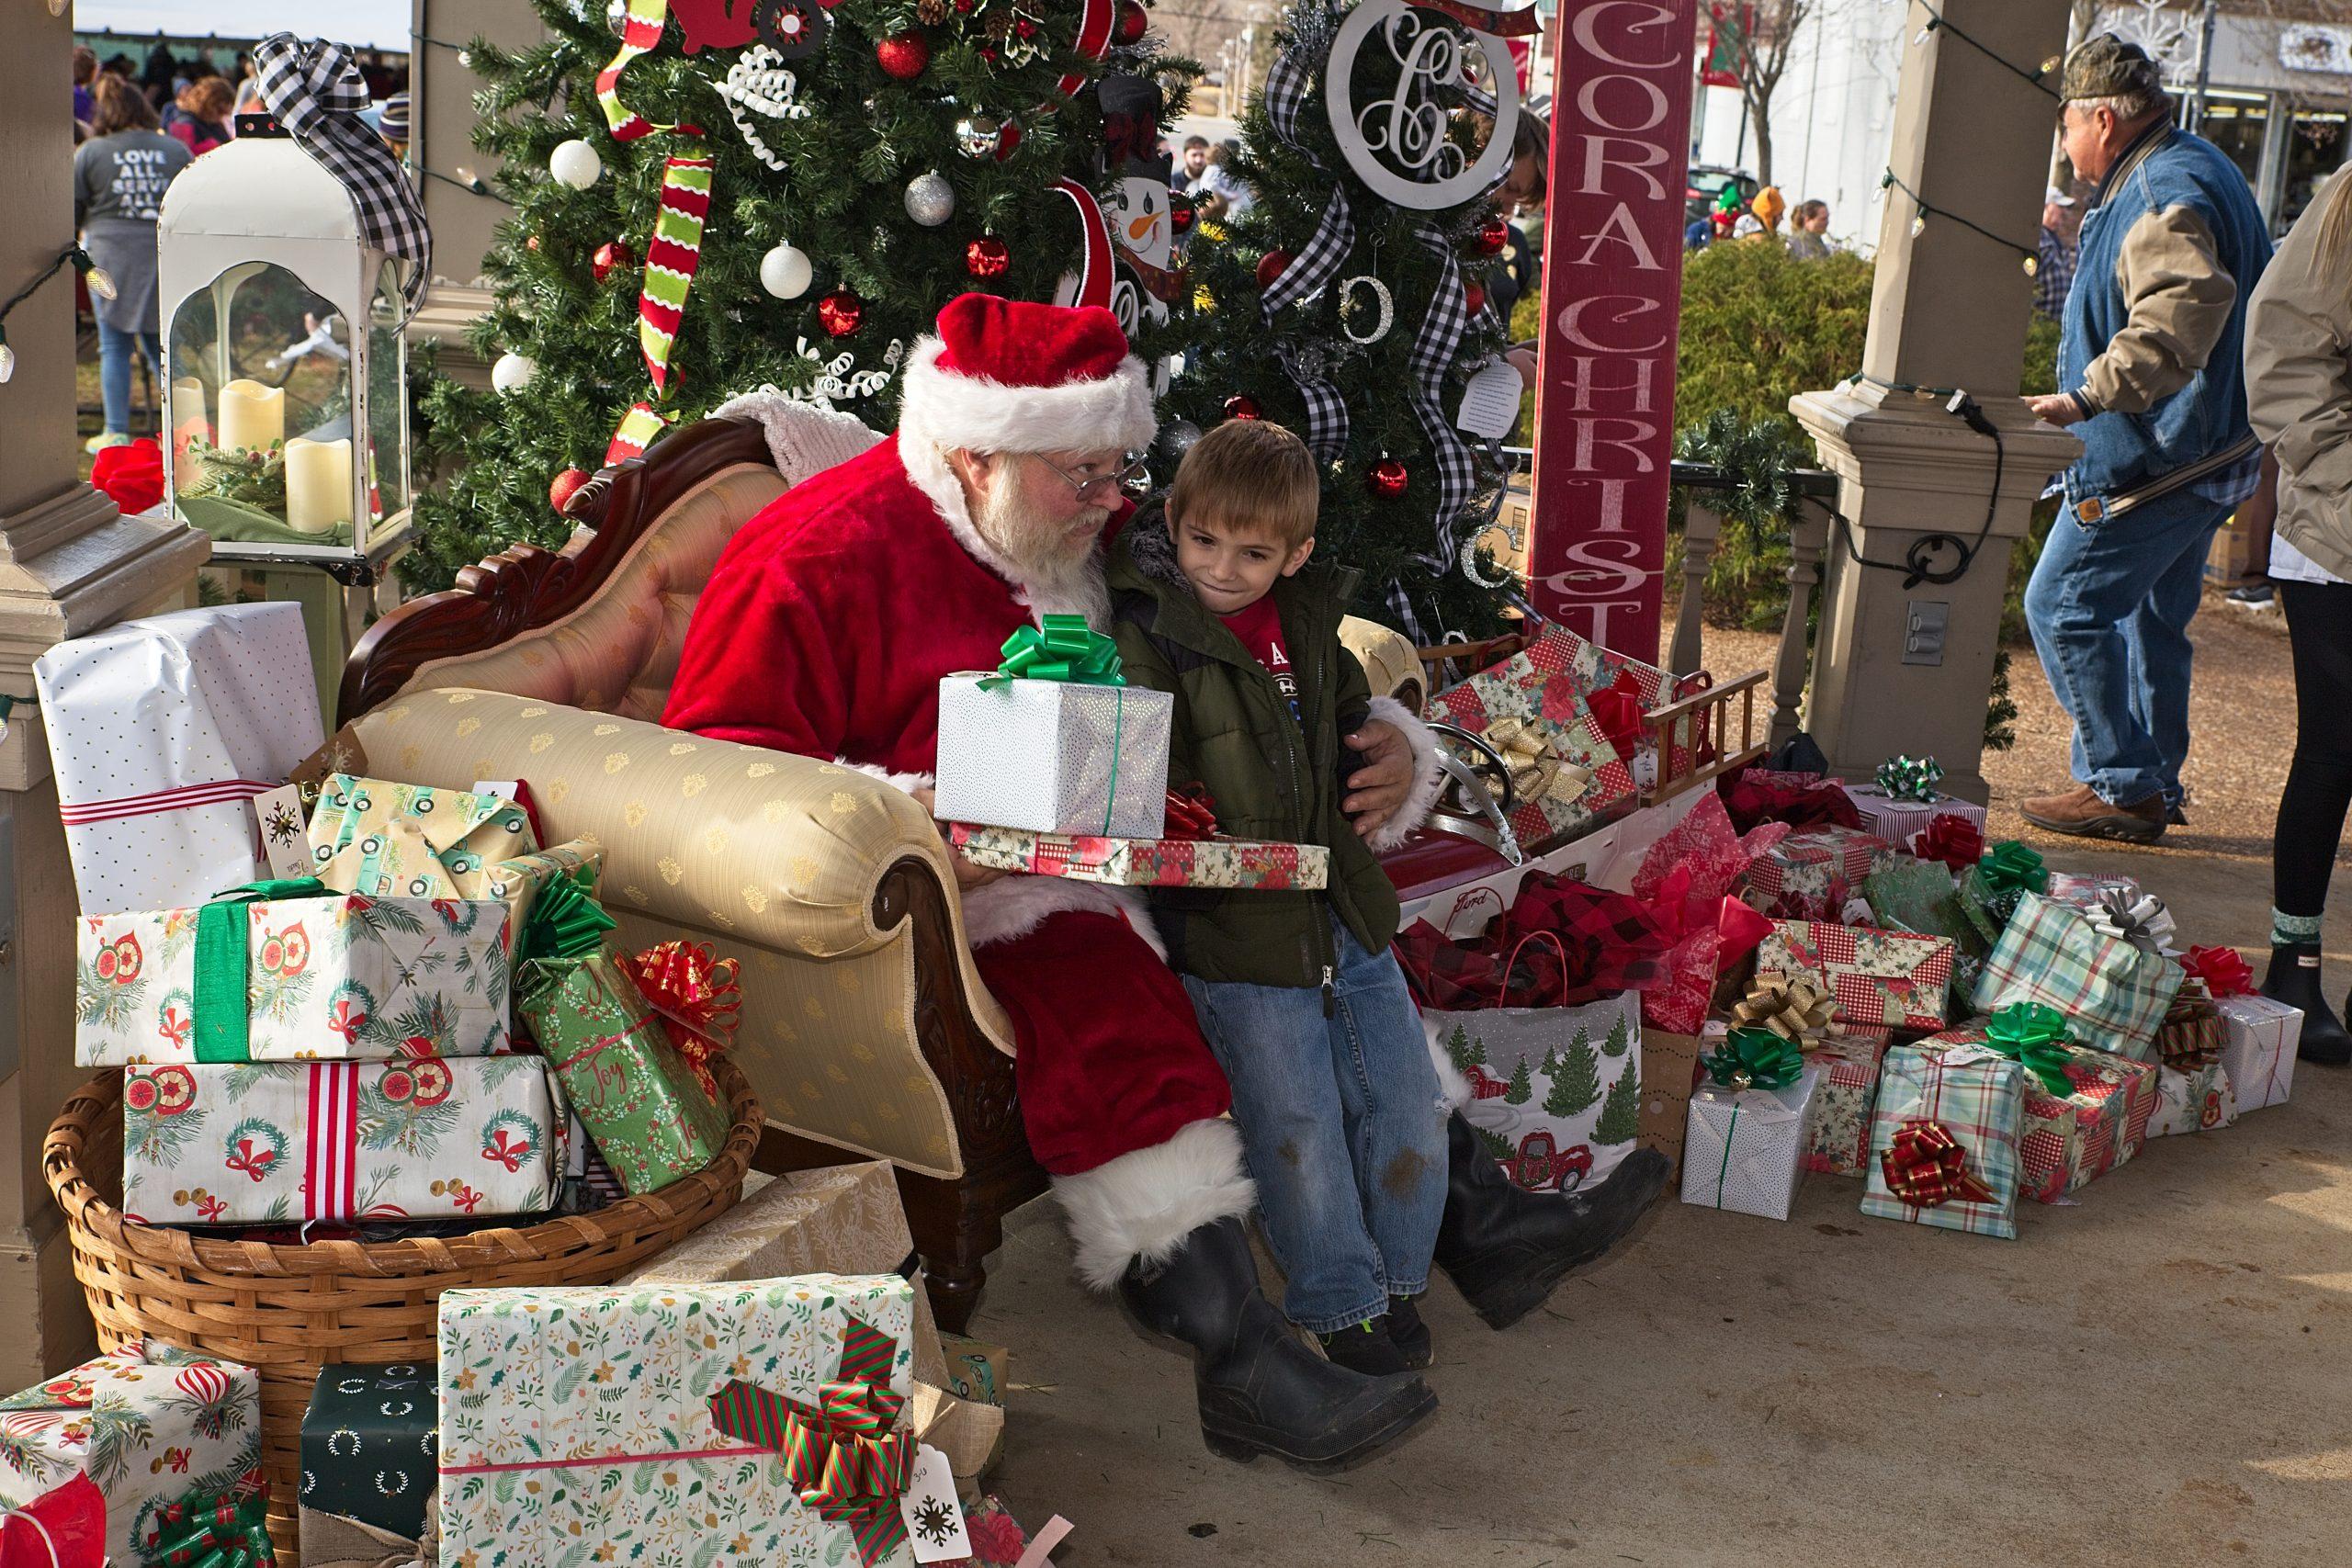 santa giving out gifts at cora's christmas in lawrenceburg tn